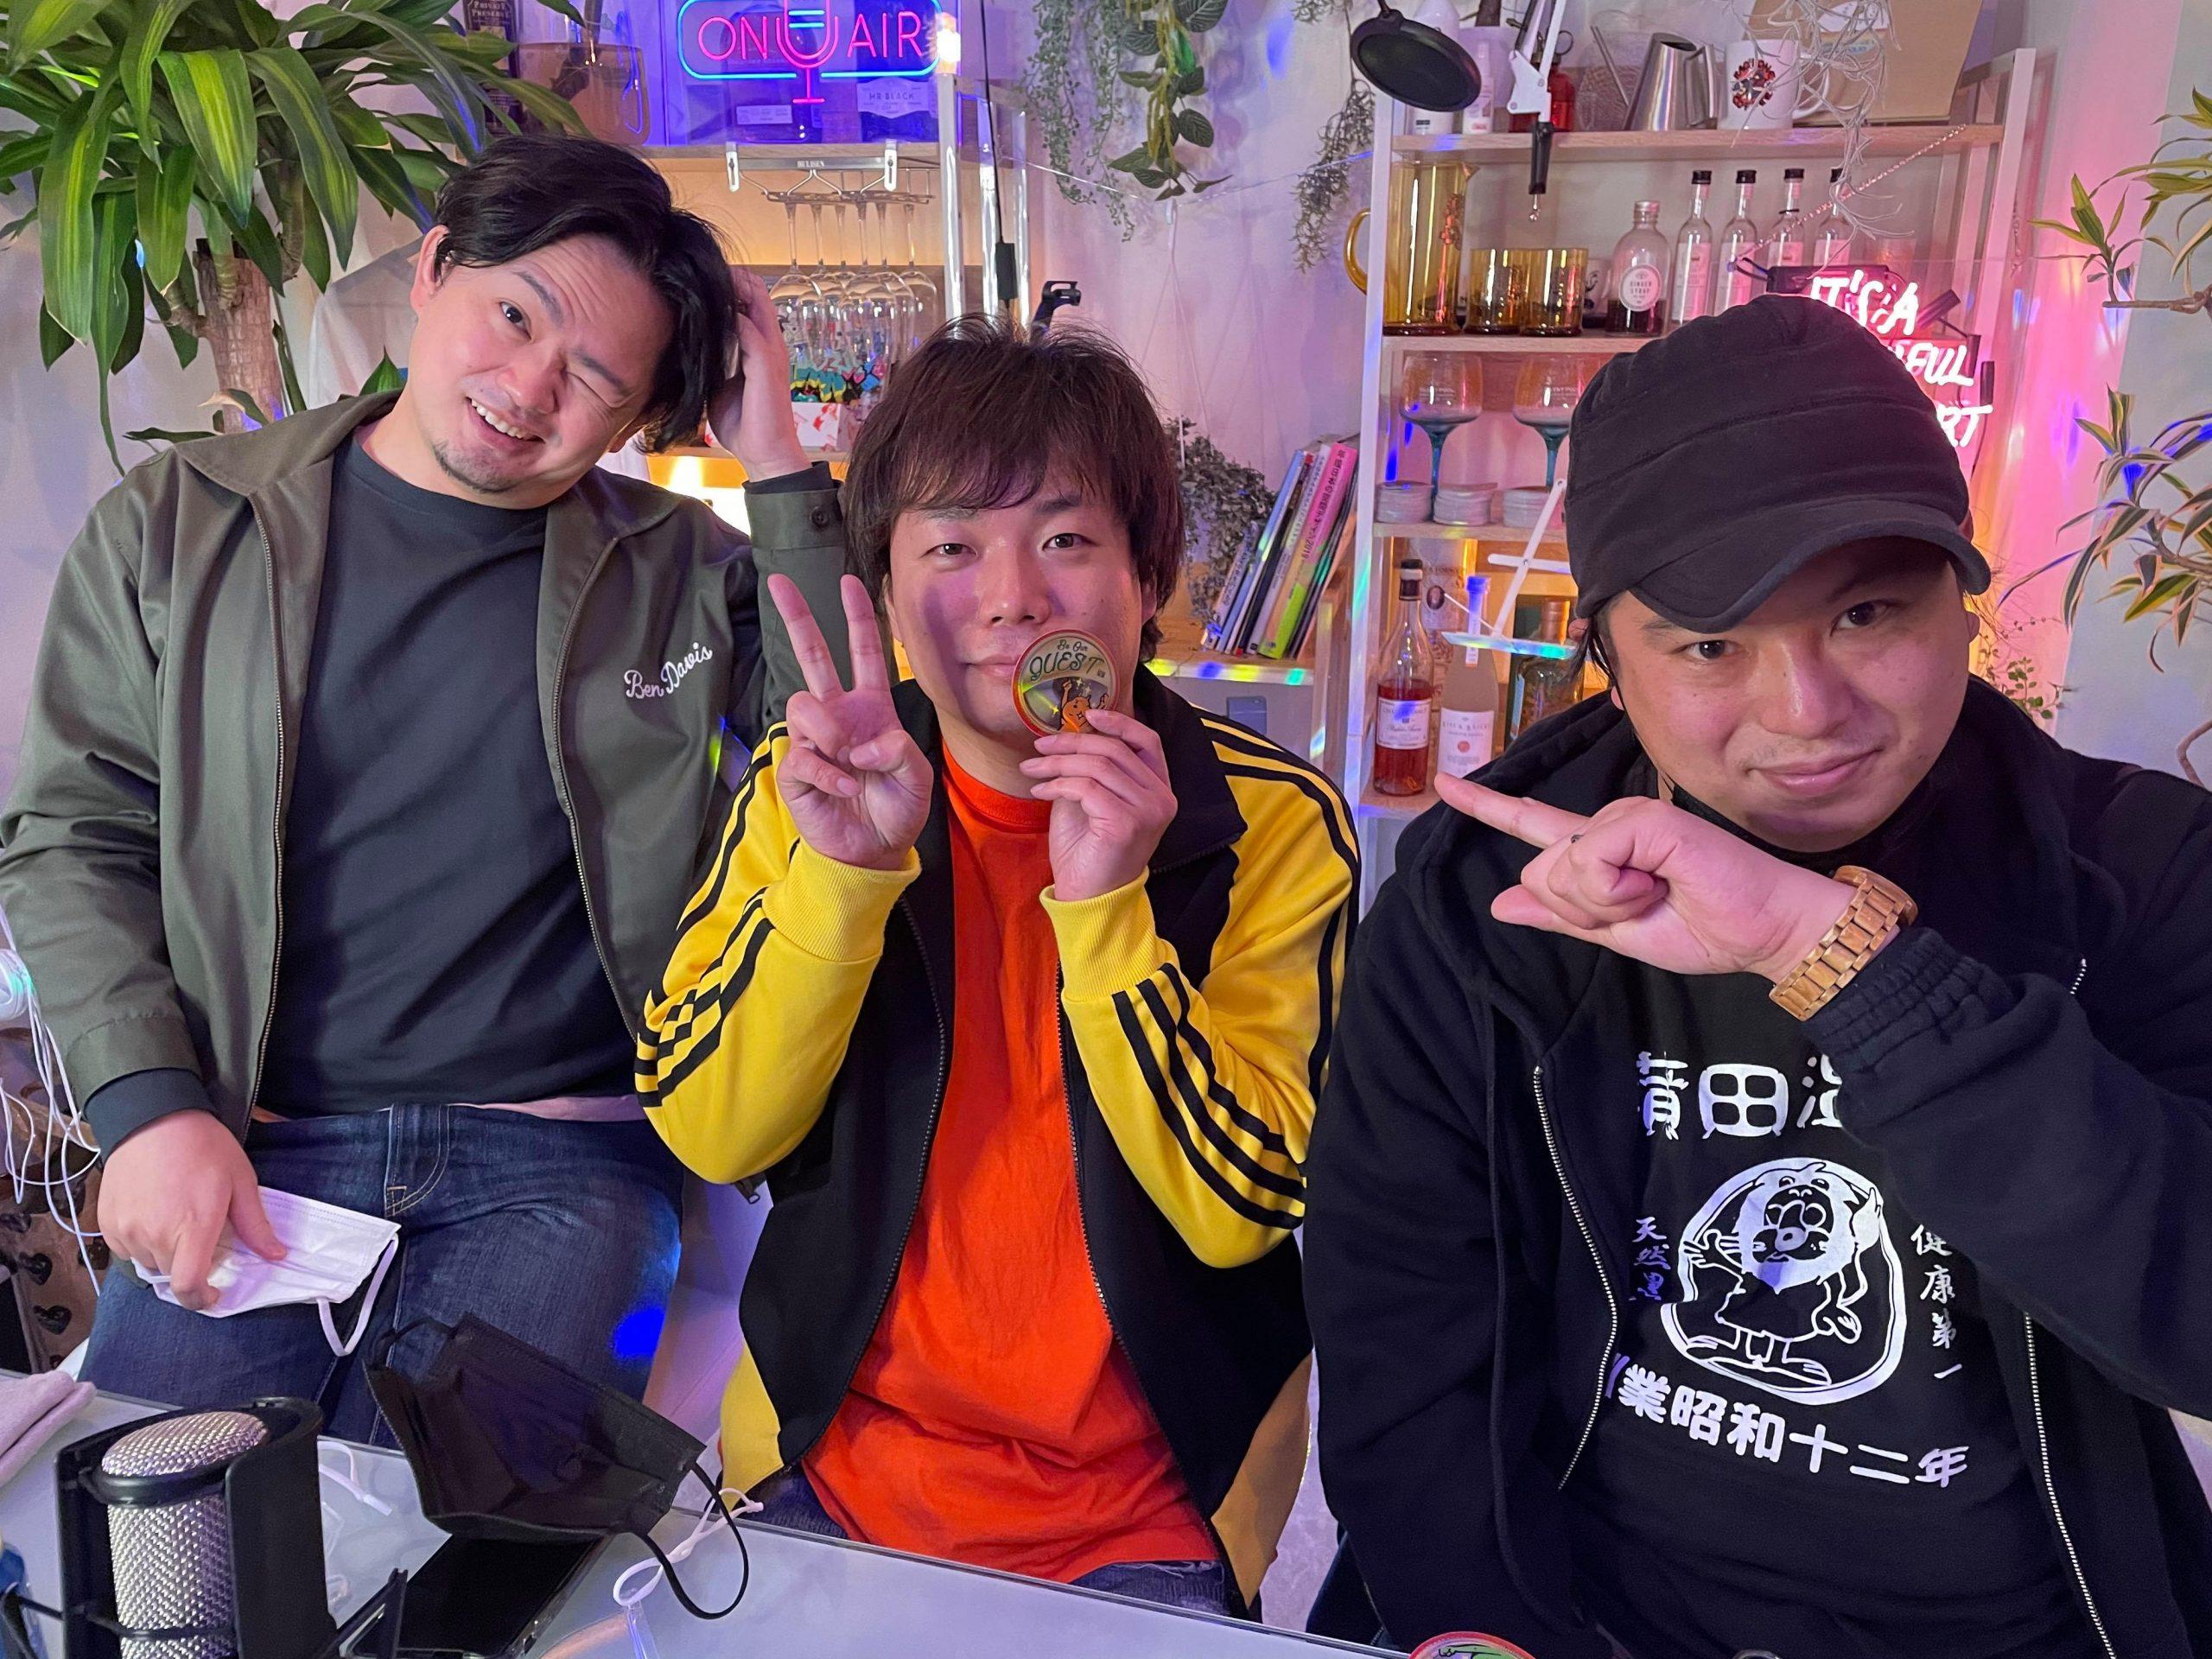 """#Daizo999 ~銀河放送局~"" 【MC】44tk / LIAR / JILOW"